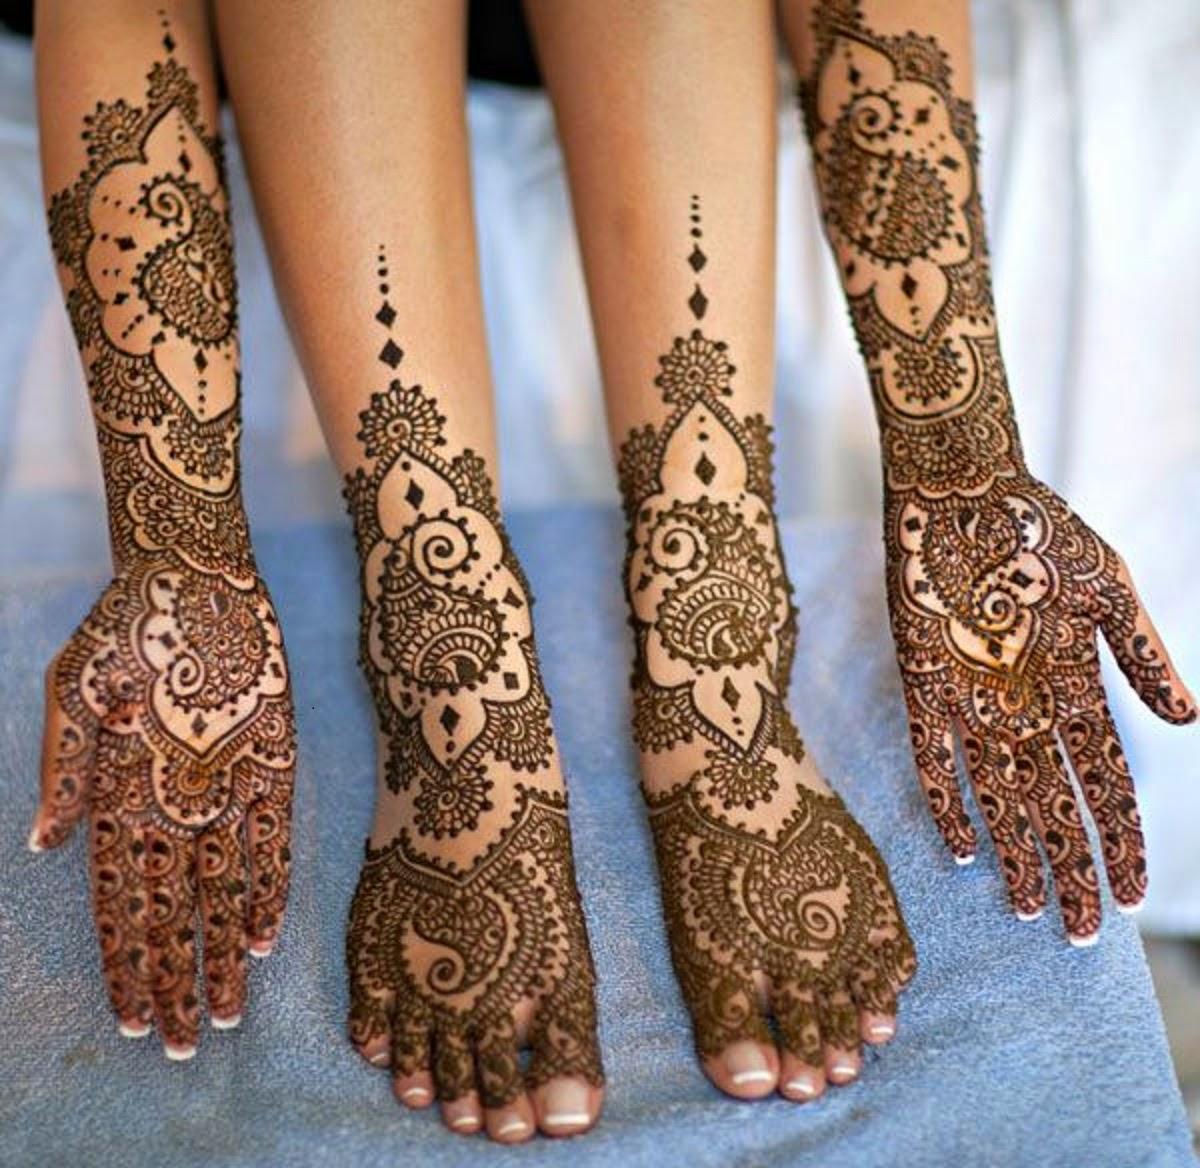 Mehndi Bride S : Bridal mehndi designs new feet and hand